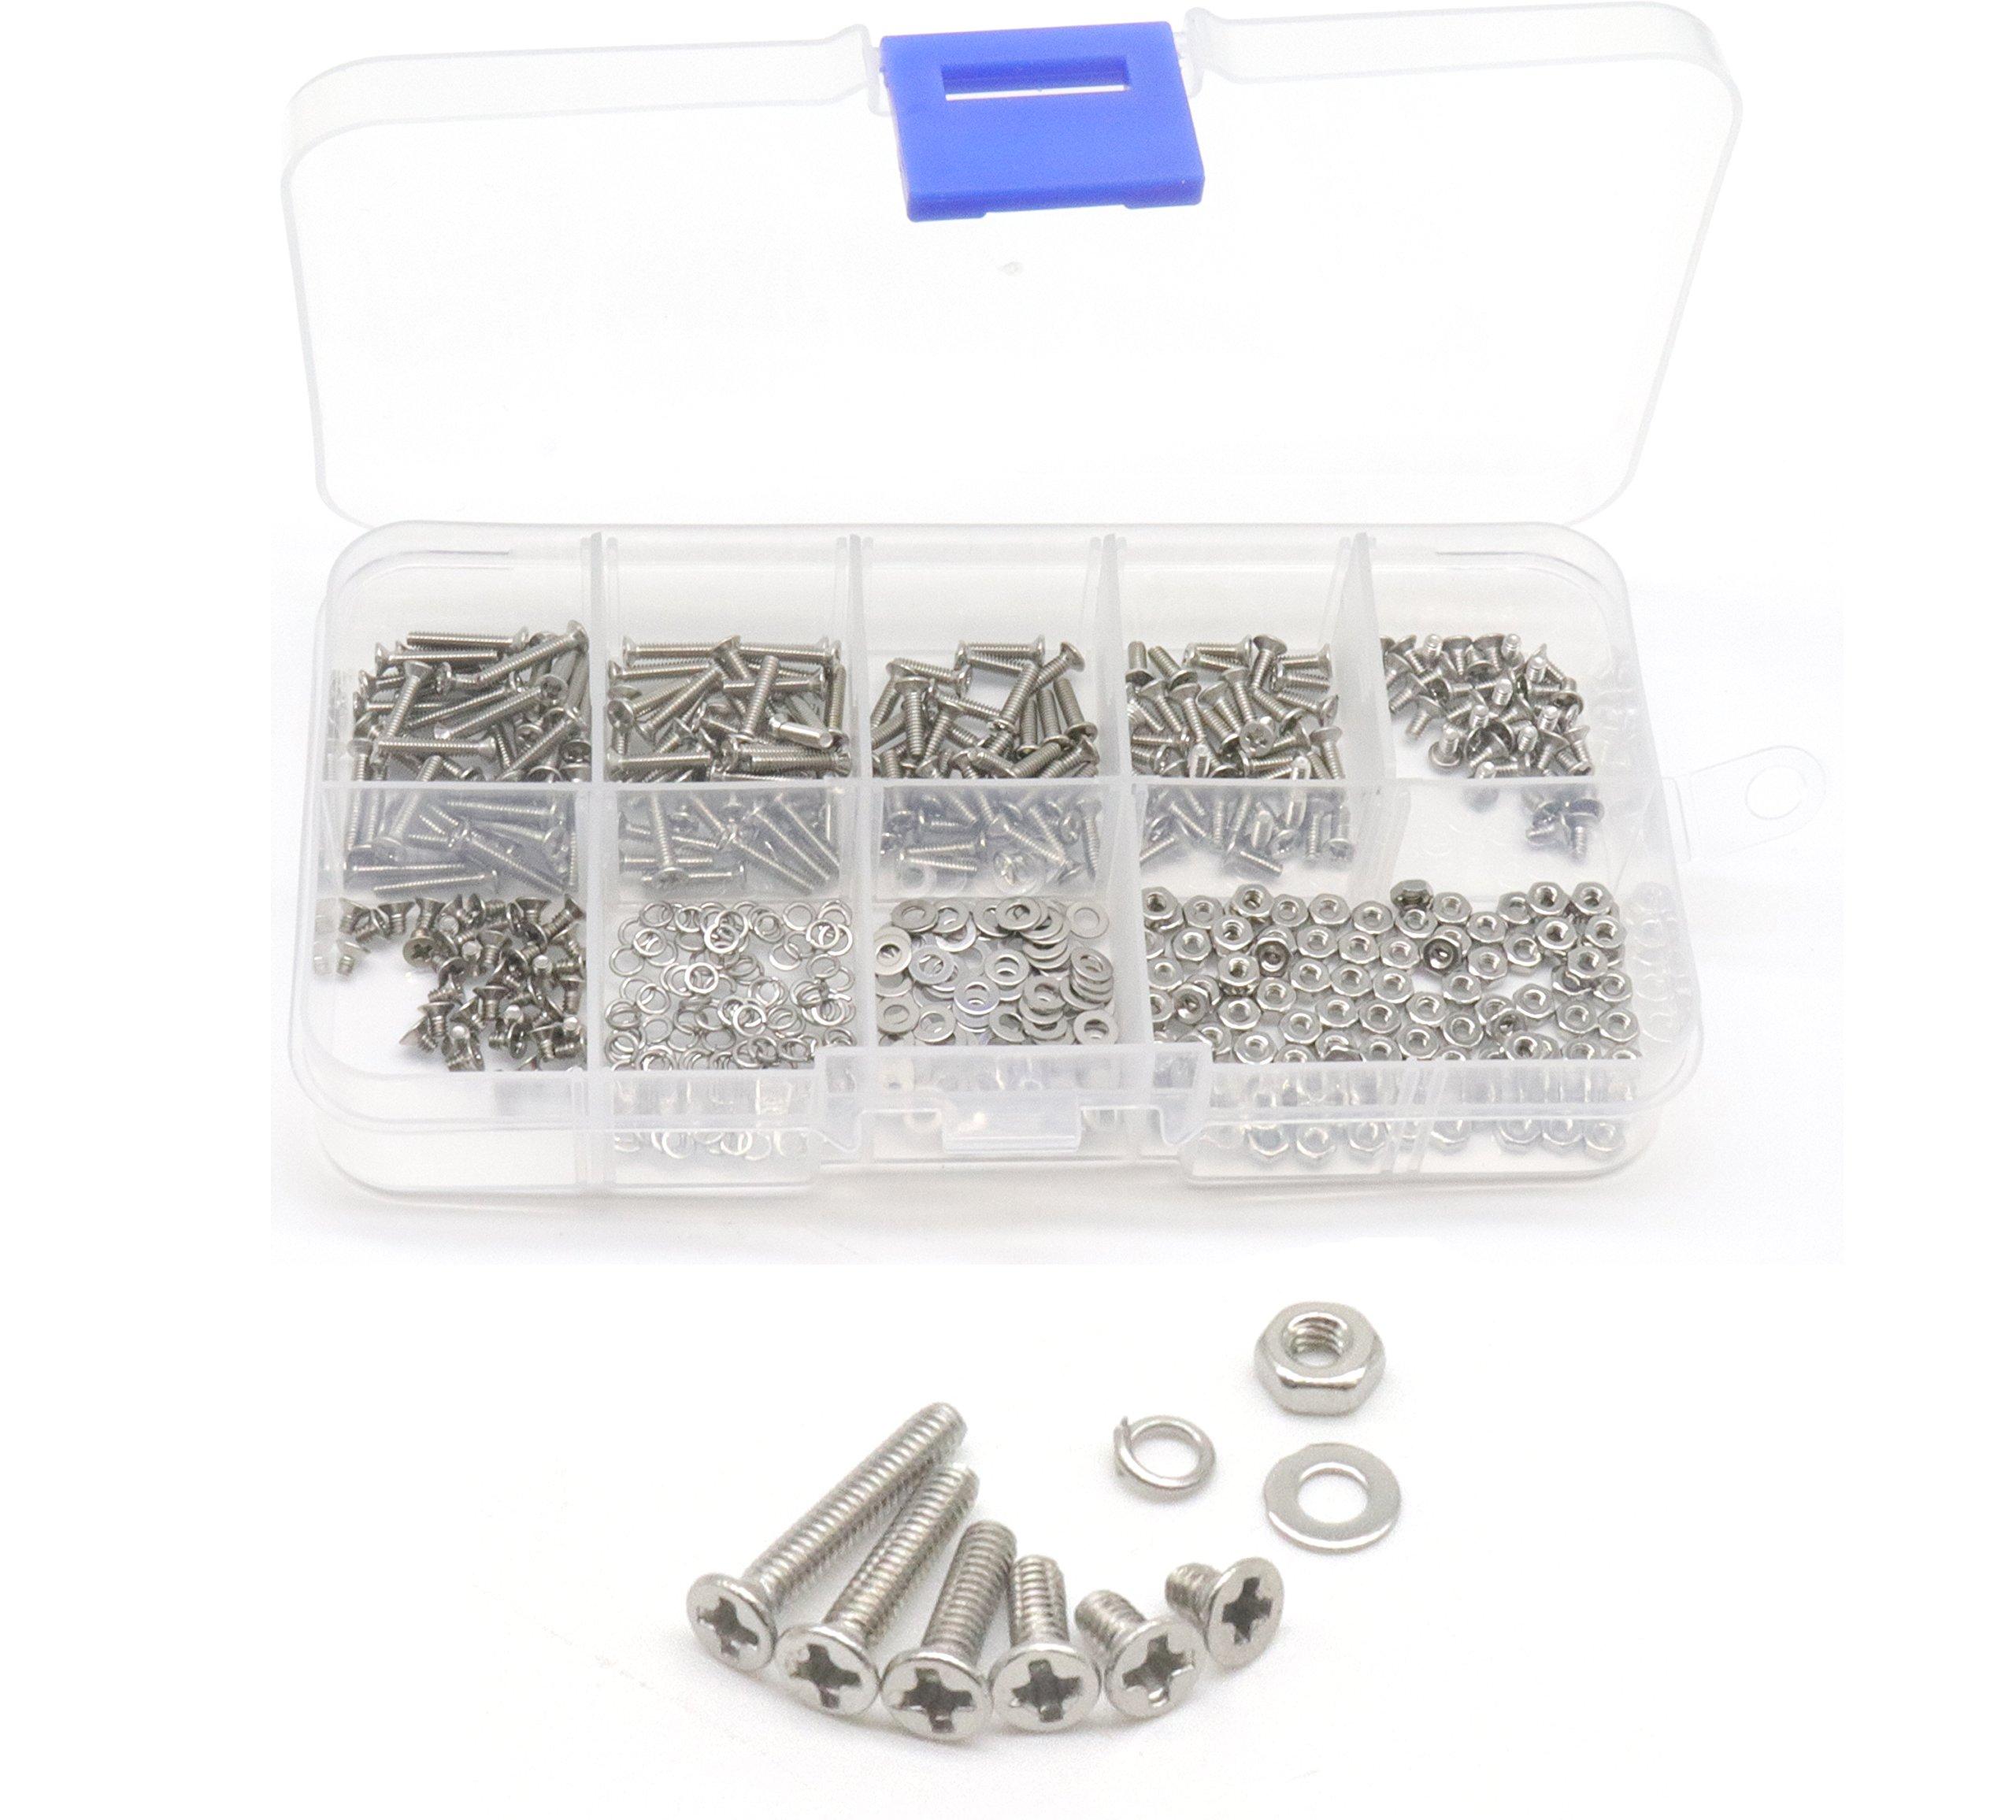 cSeao 540pcs M2 Flat Phillips Machine Screws Washers Nuts Assortment Kit, 304 Stainless Steel